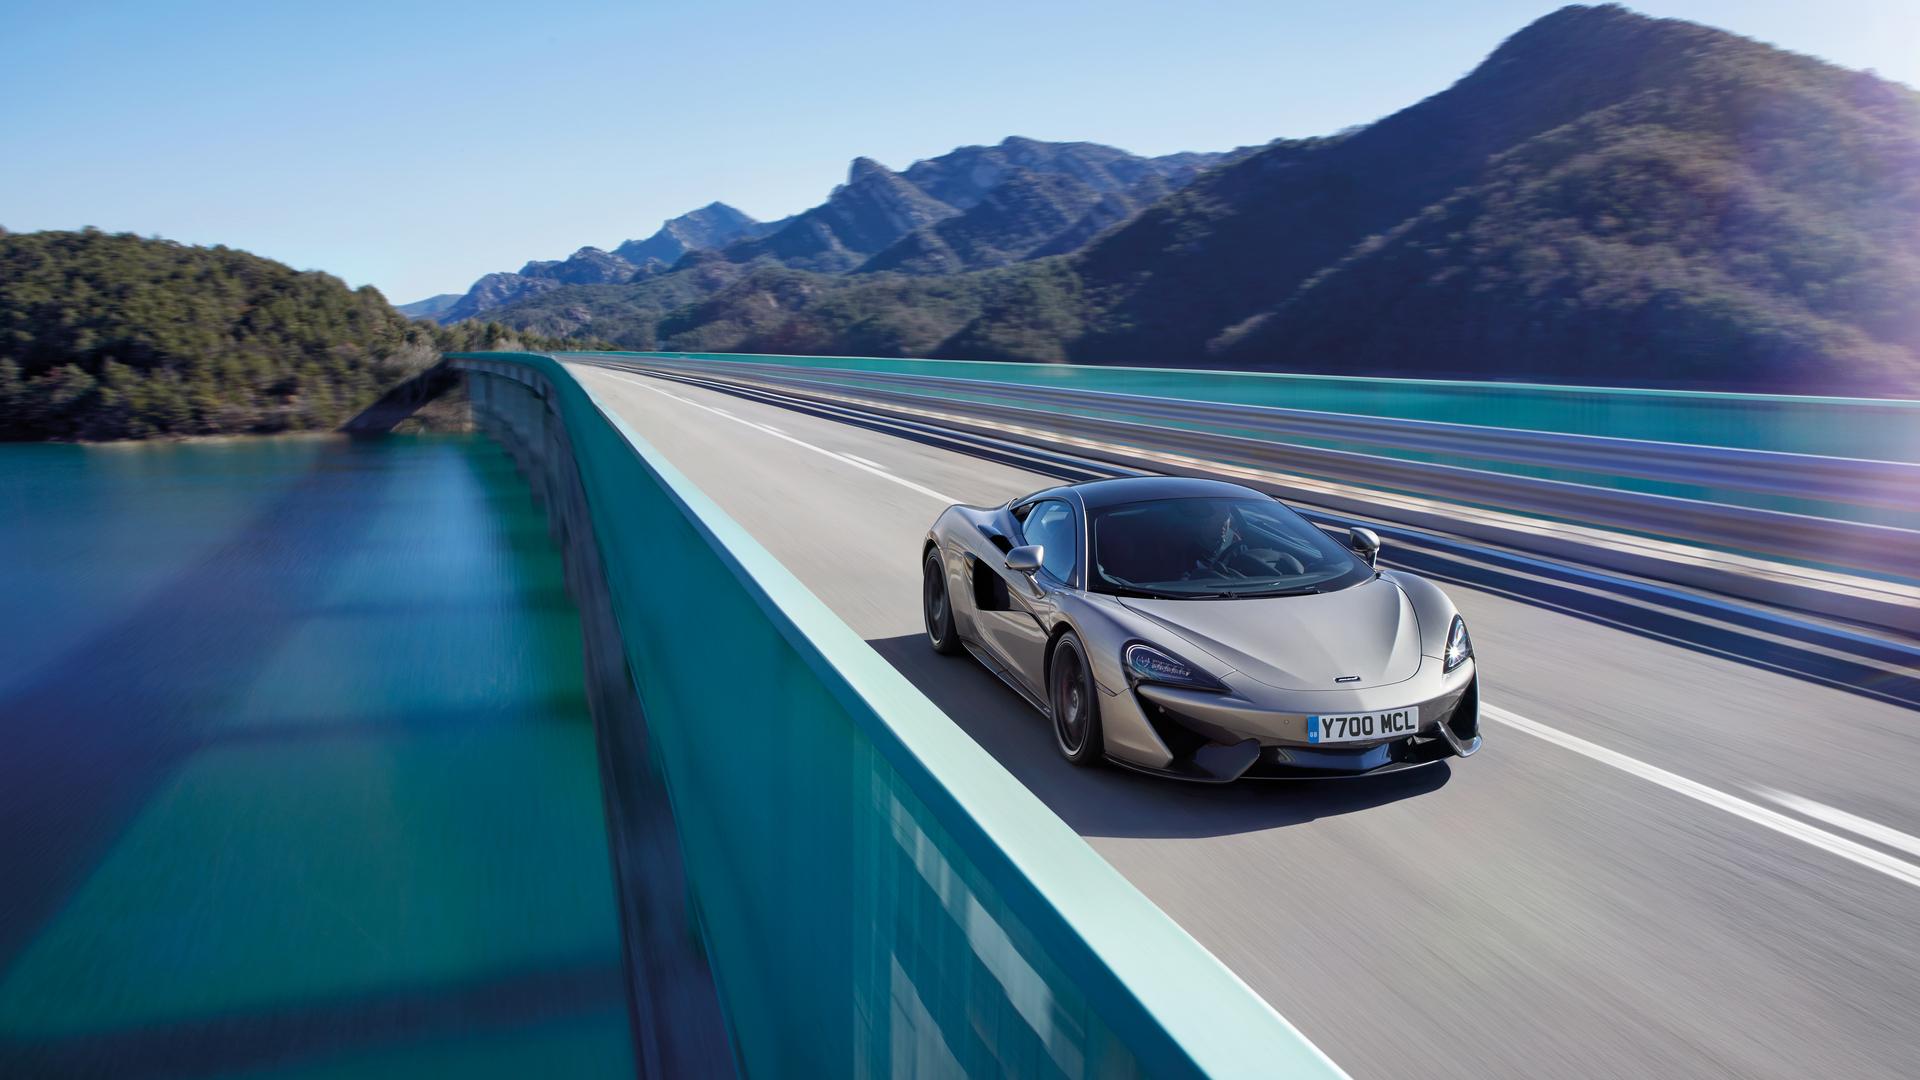 2020 McLaren 570S Coupe Performance